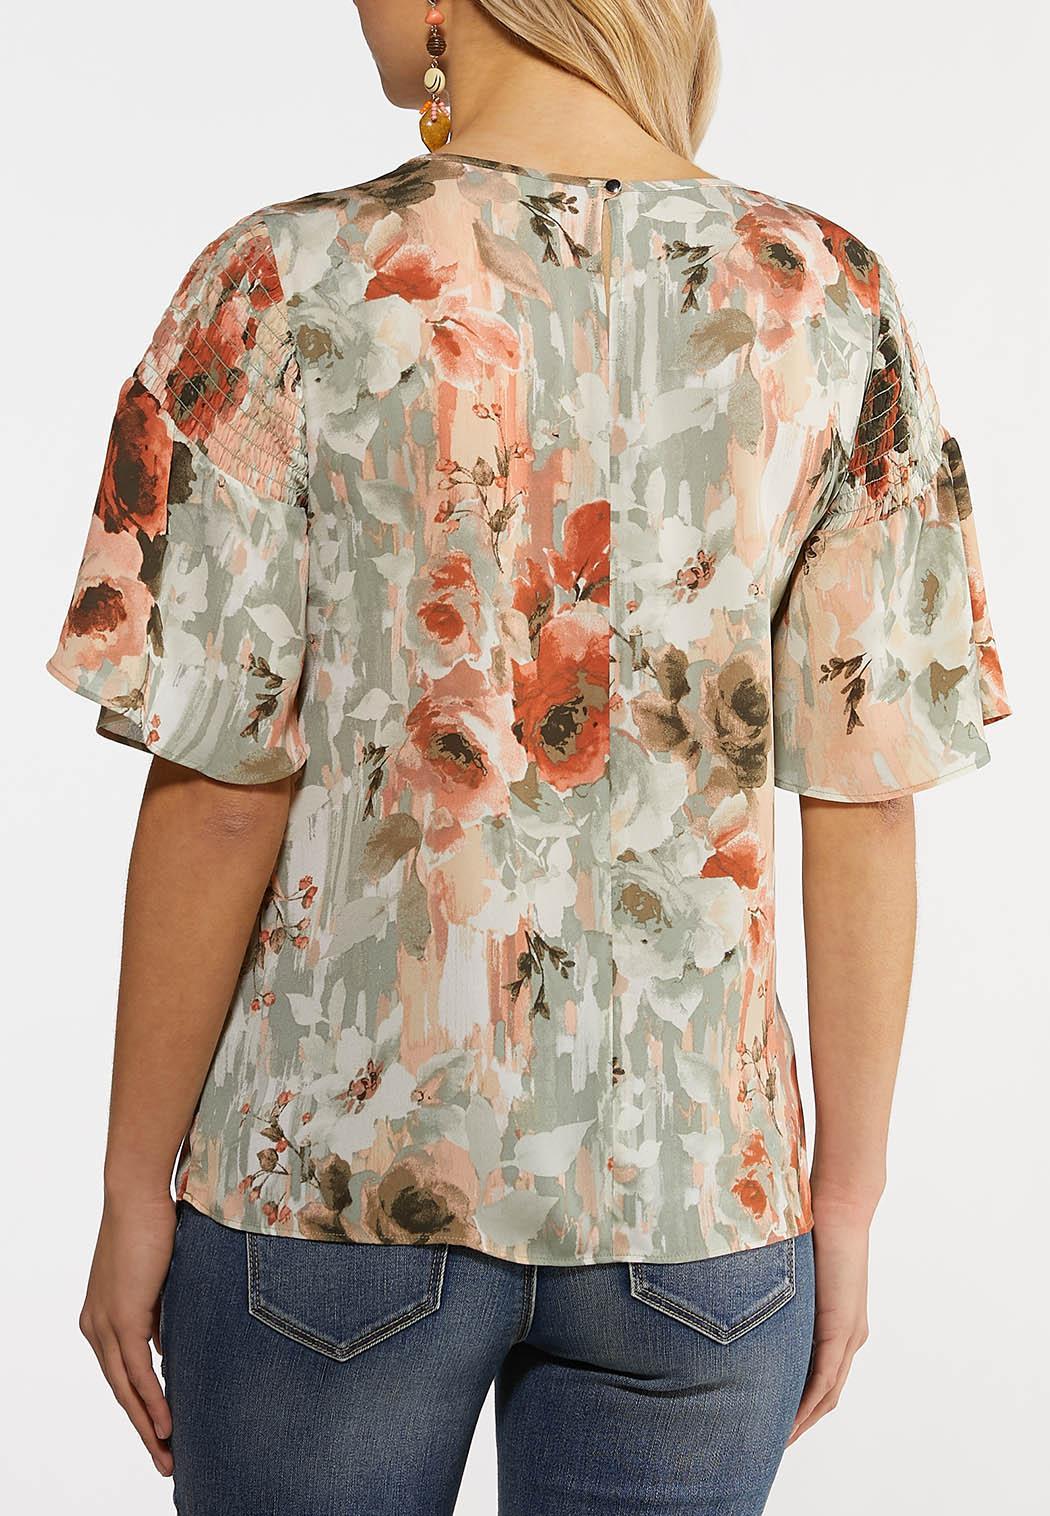 Enchanted Floral Top (Item #44185365)